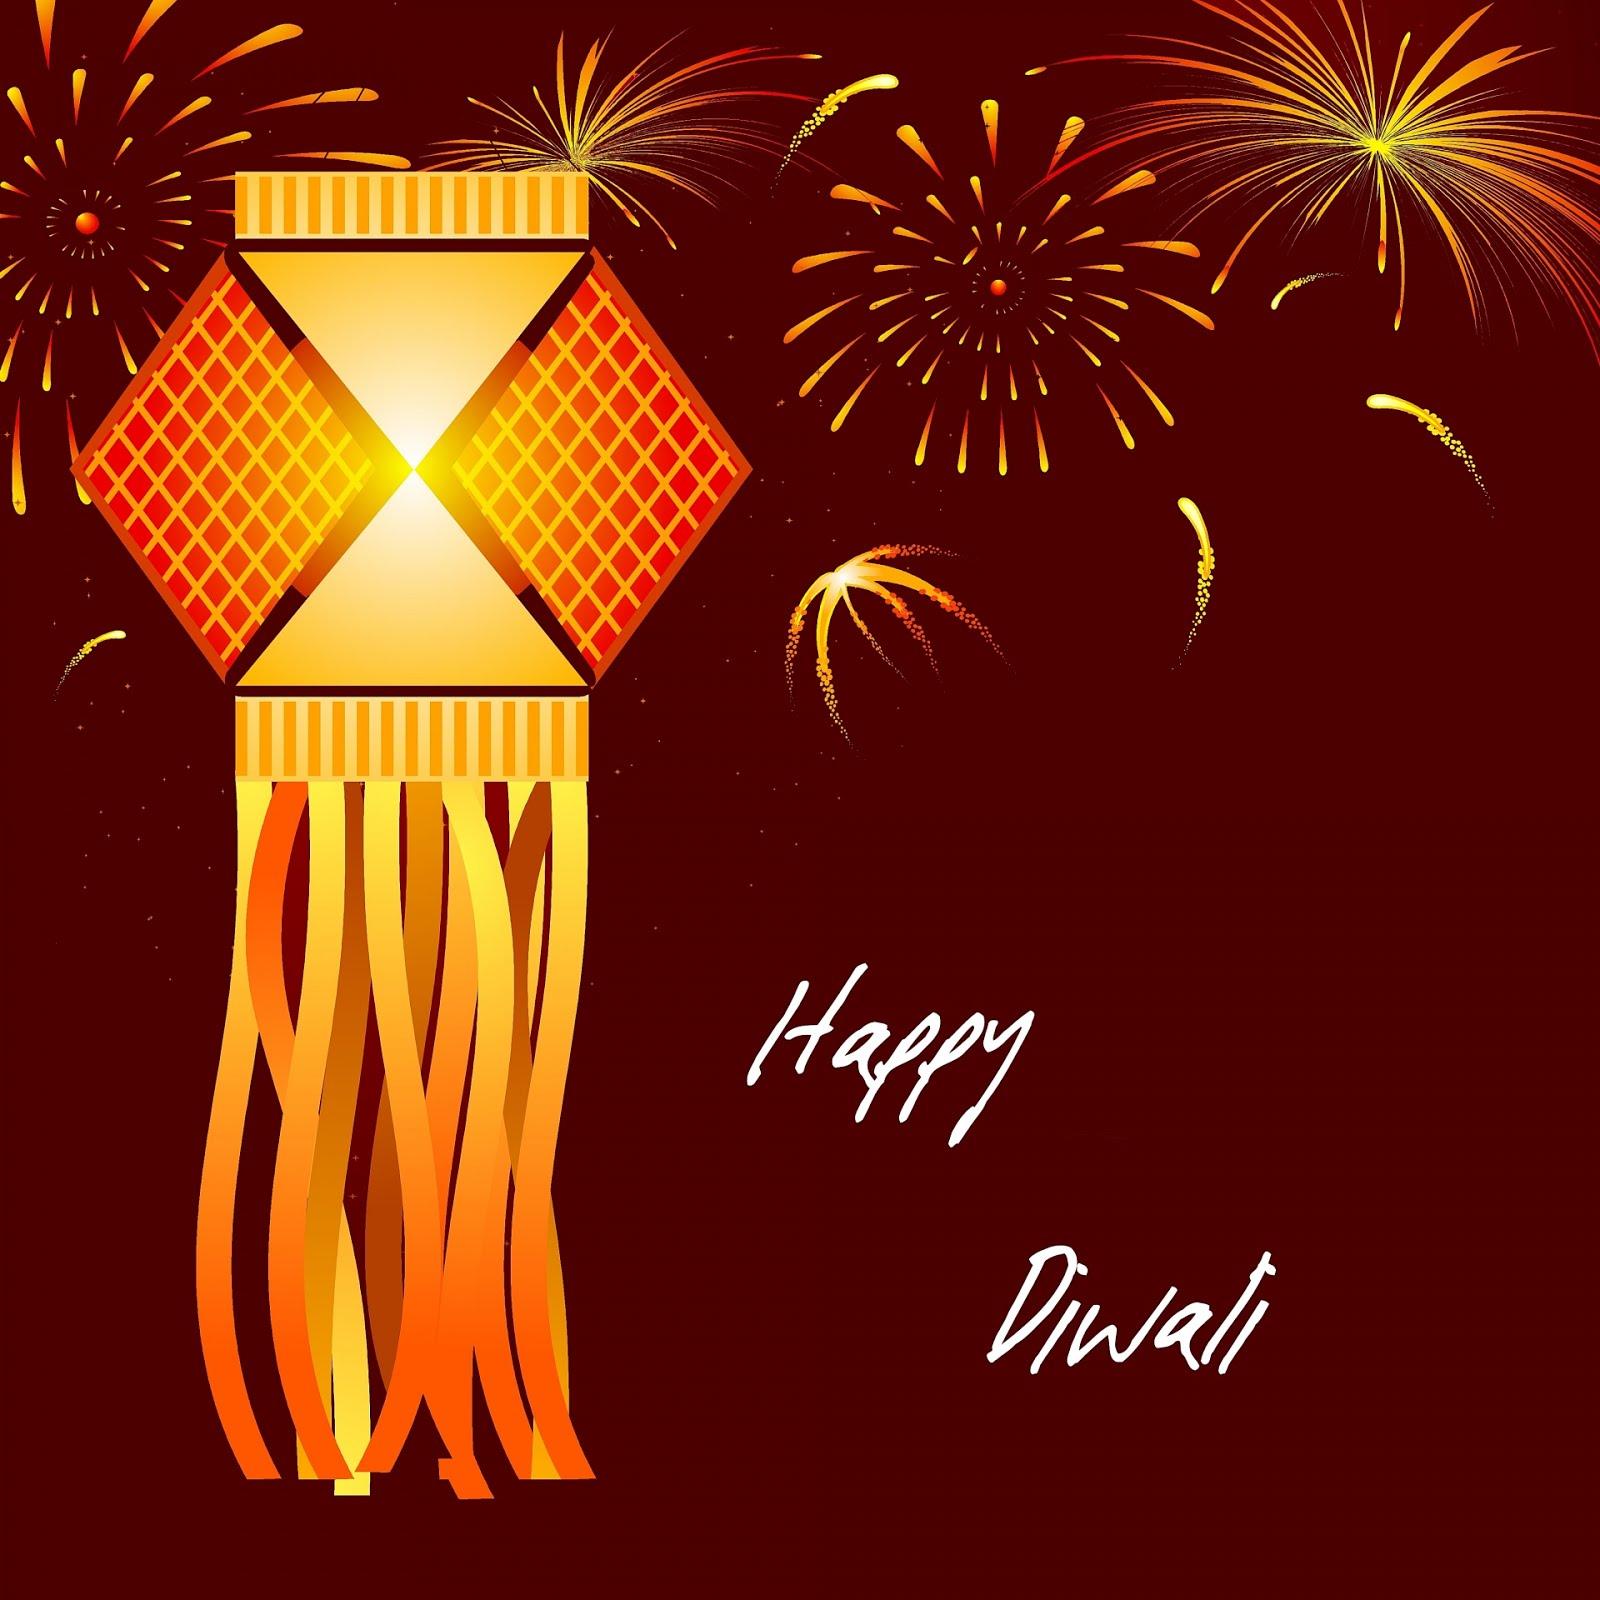 Happy Diwali 2018 Greetings Diwali Greetings Happy Diwali 2018